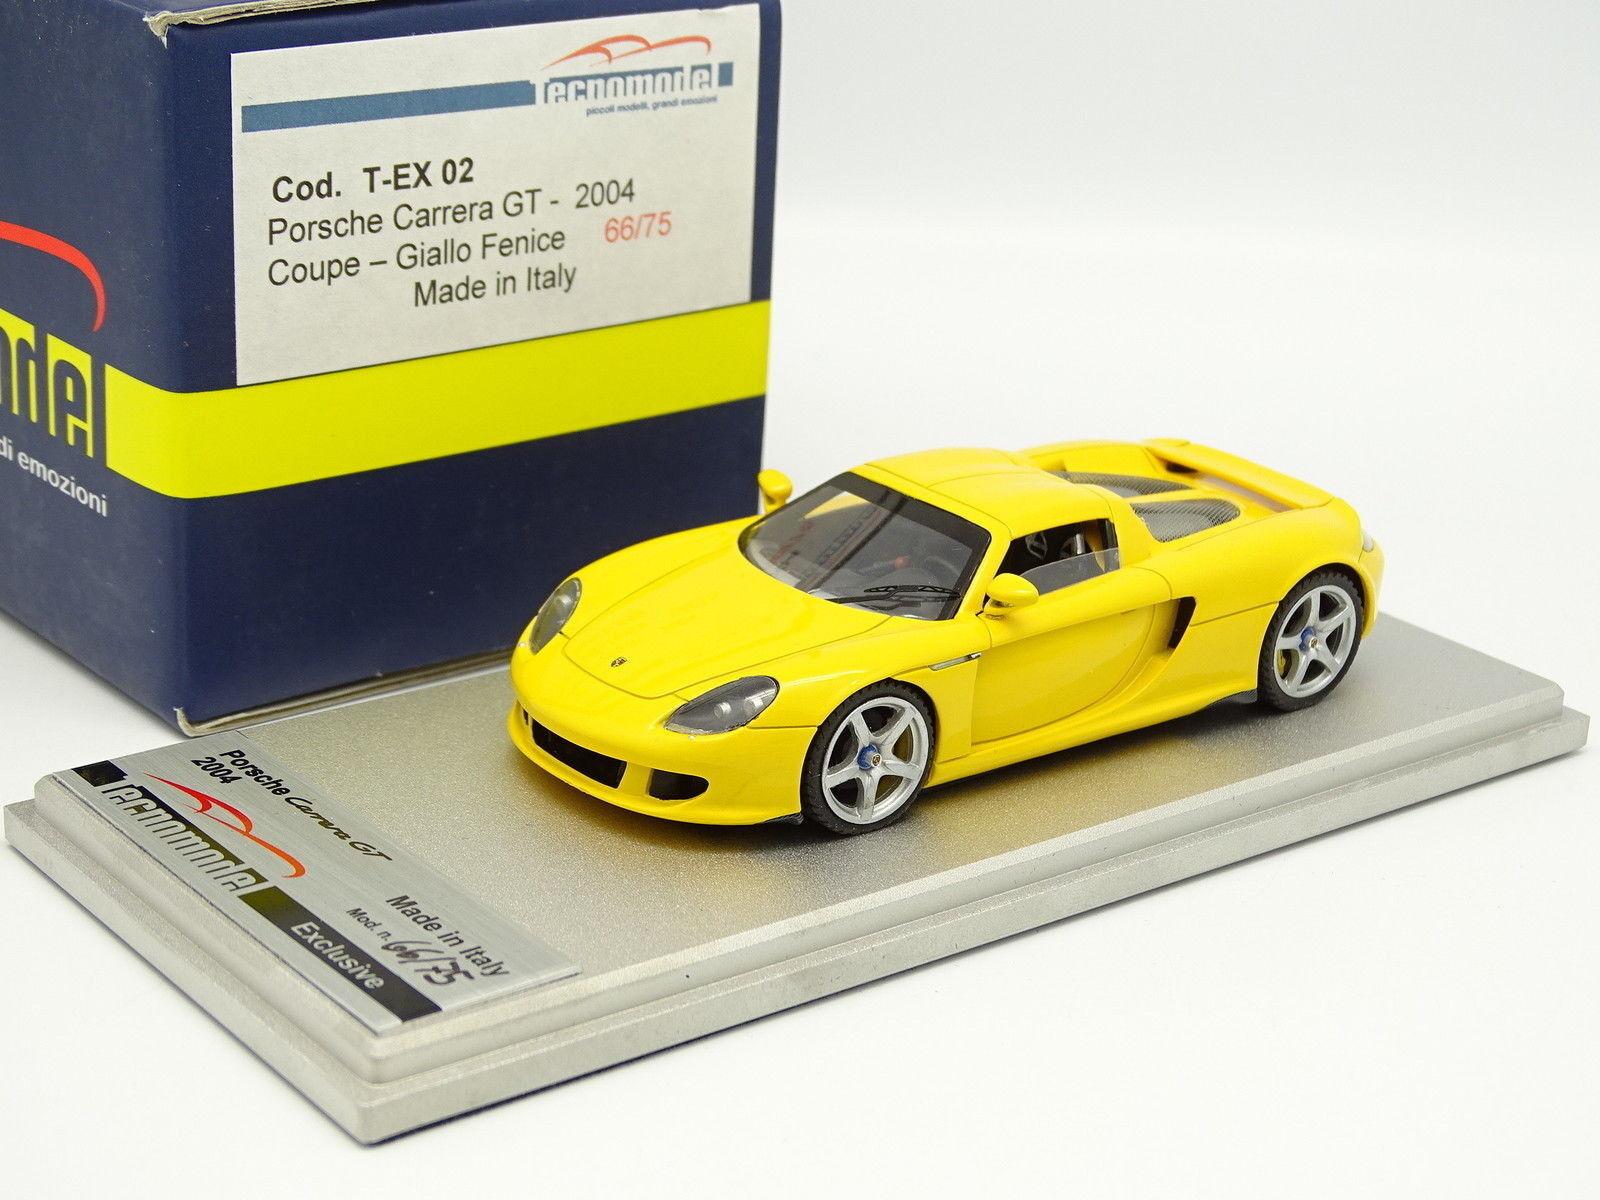 Tecnomodell 1 43 - Porsche bilrera GT Coupe 2004 gul